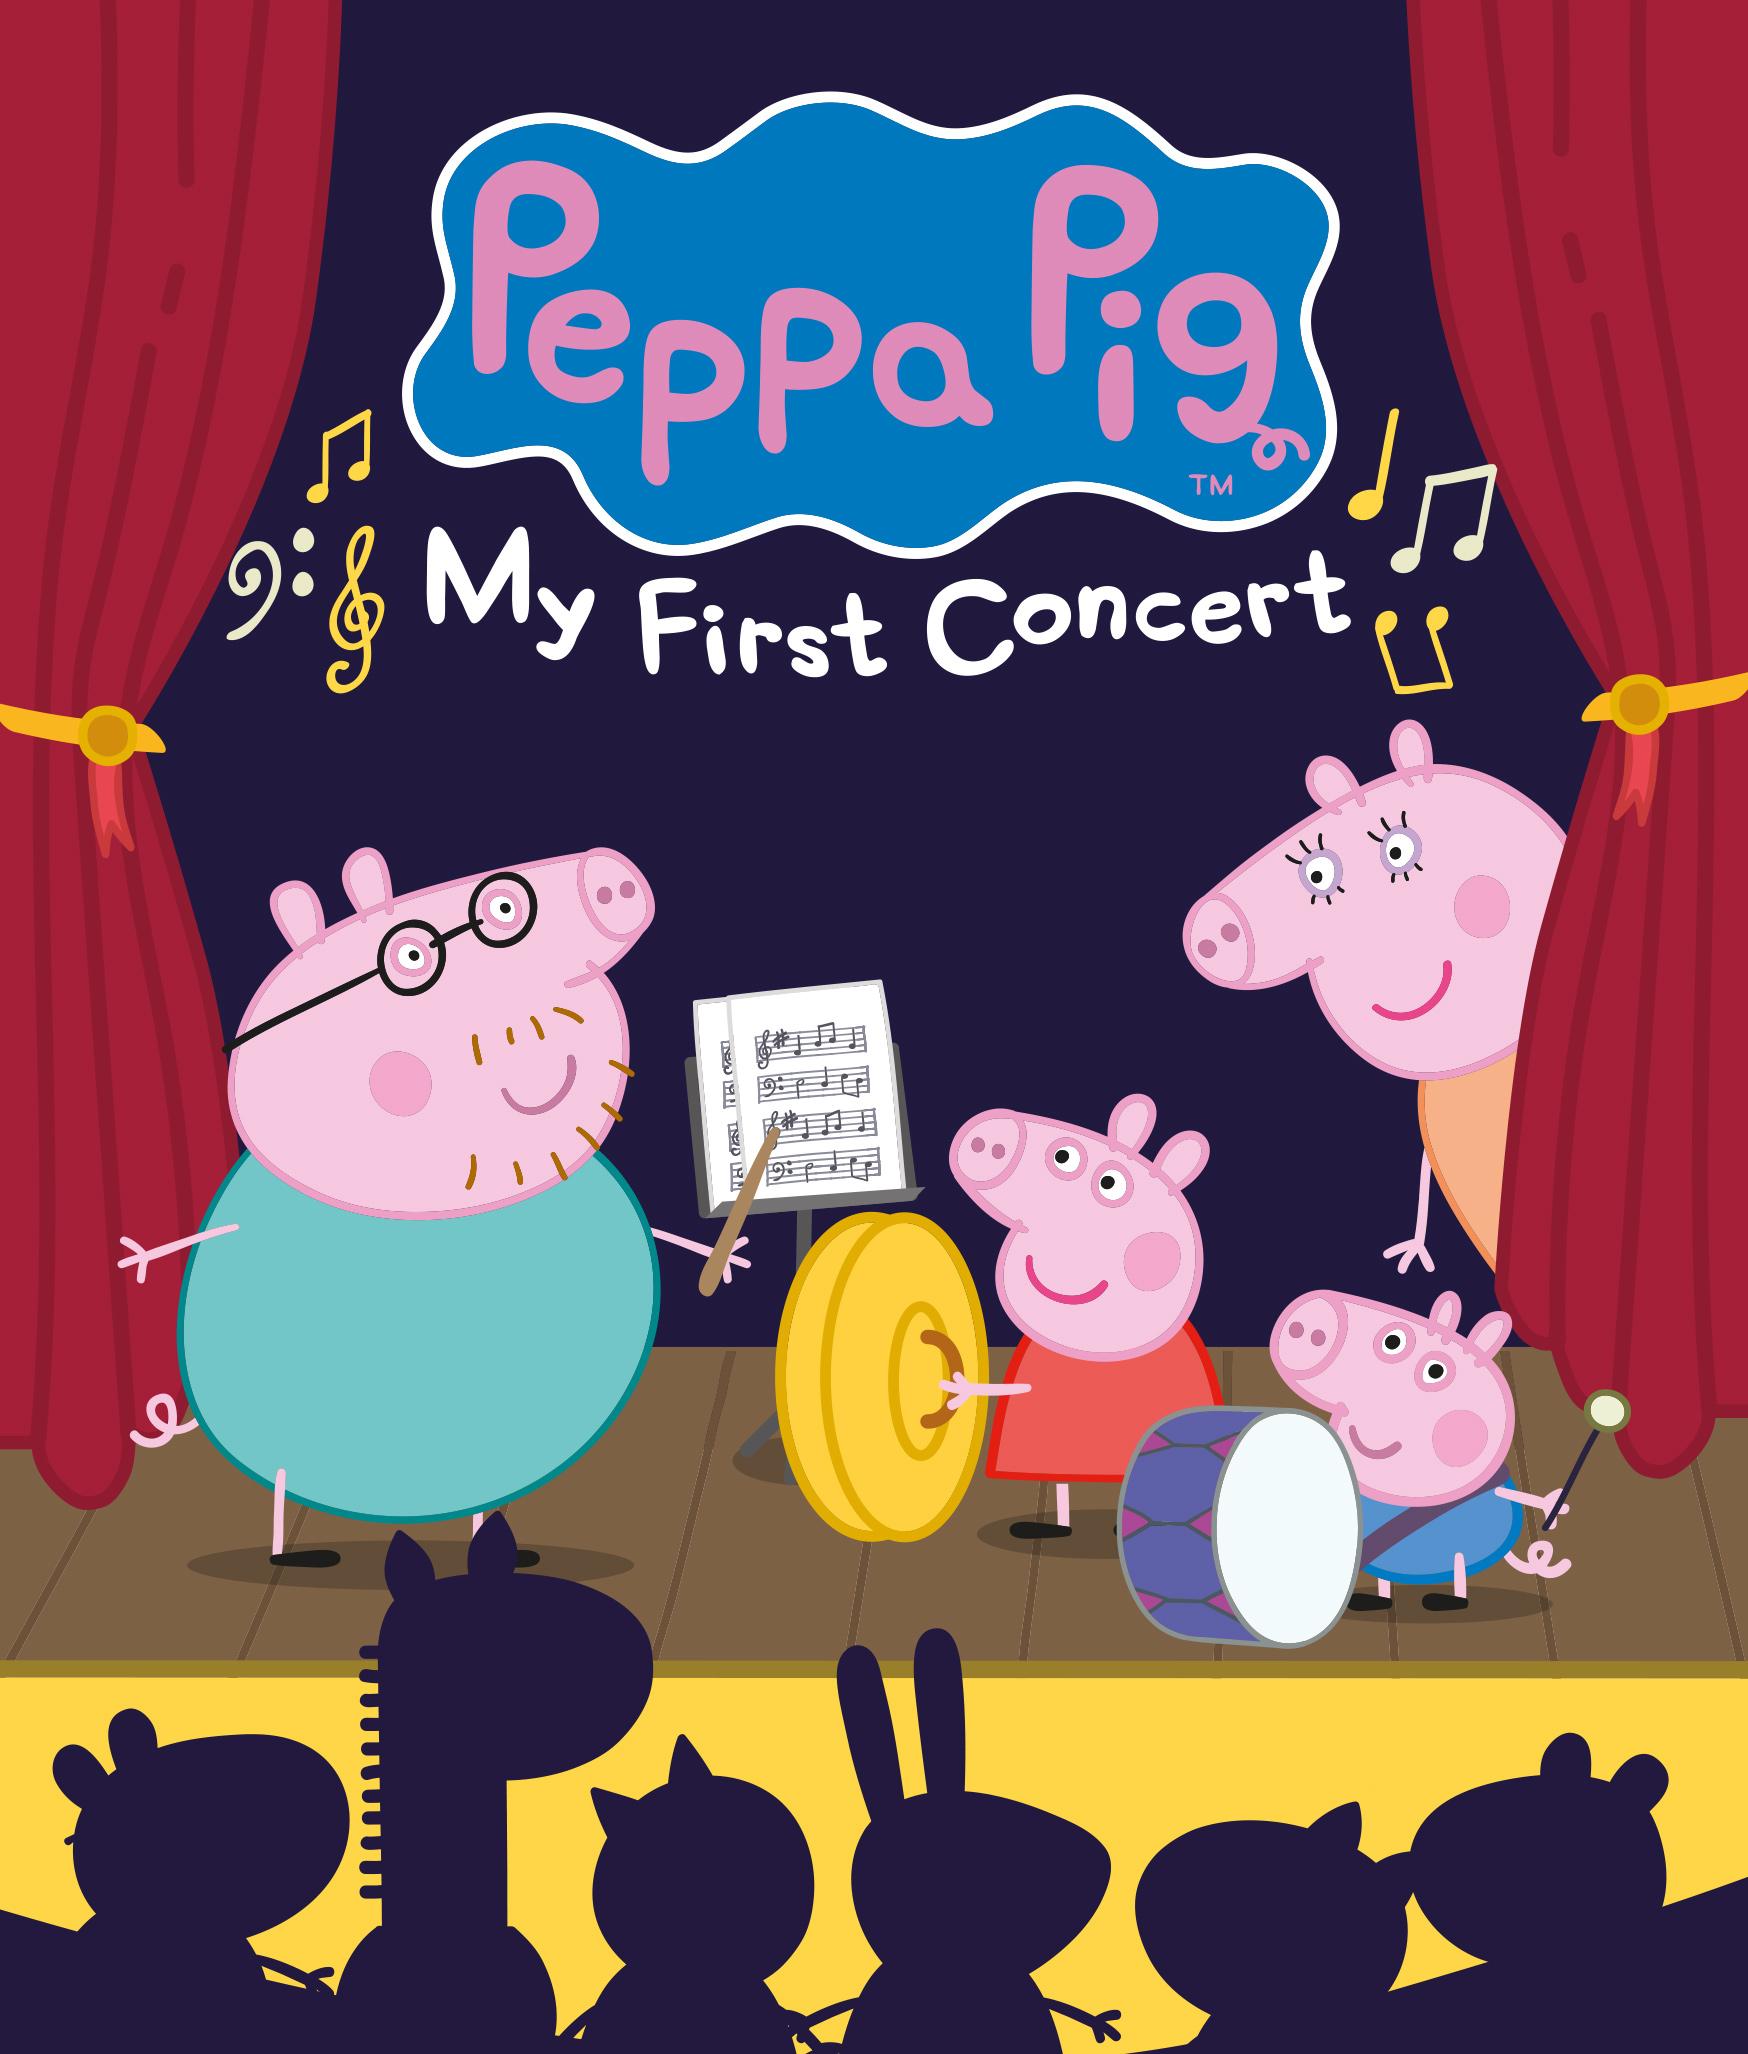 Peppa Pig - My First Concert (2019)